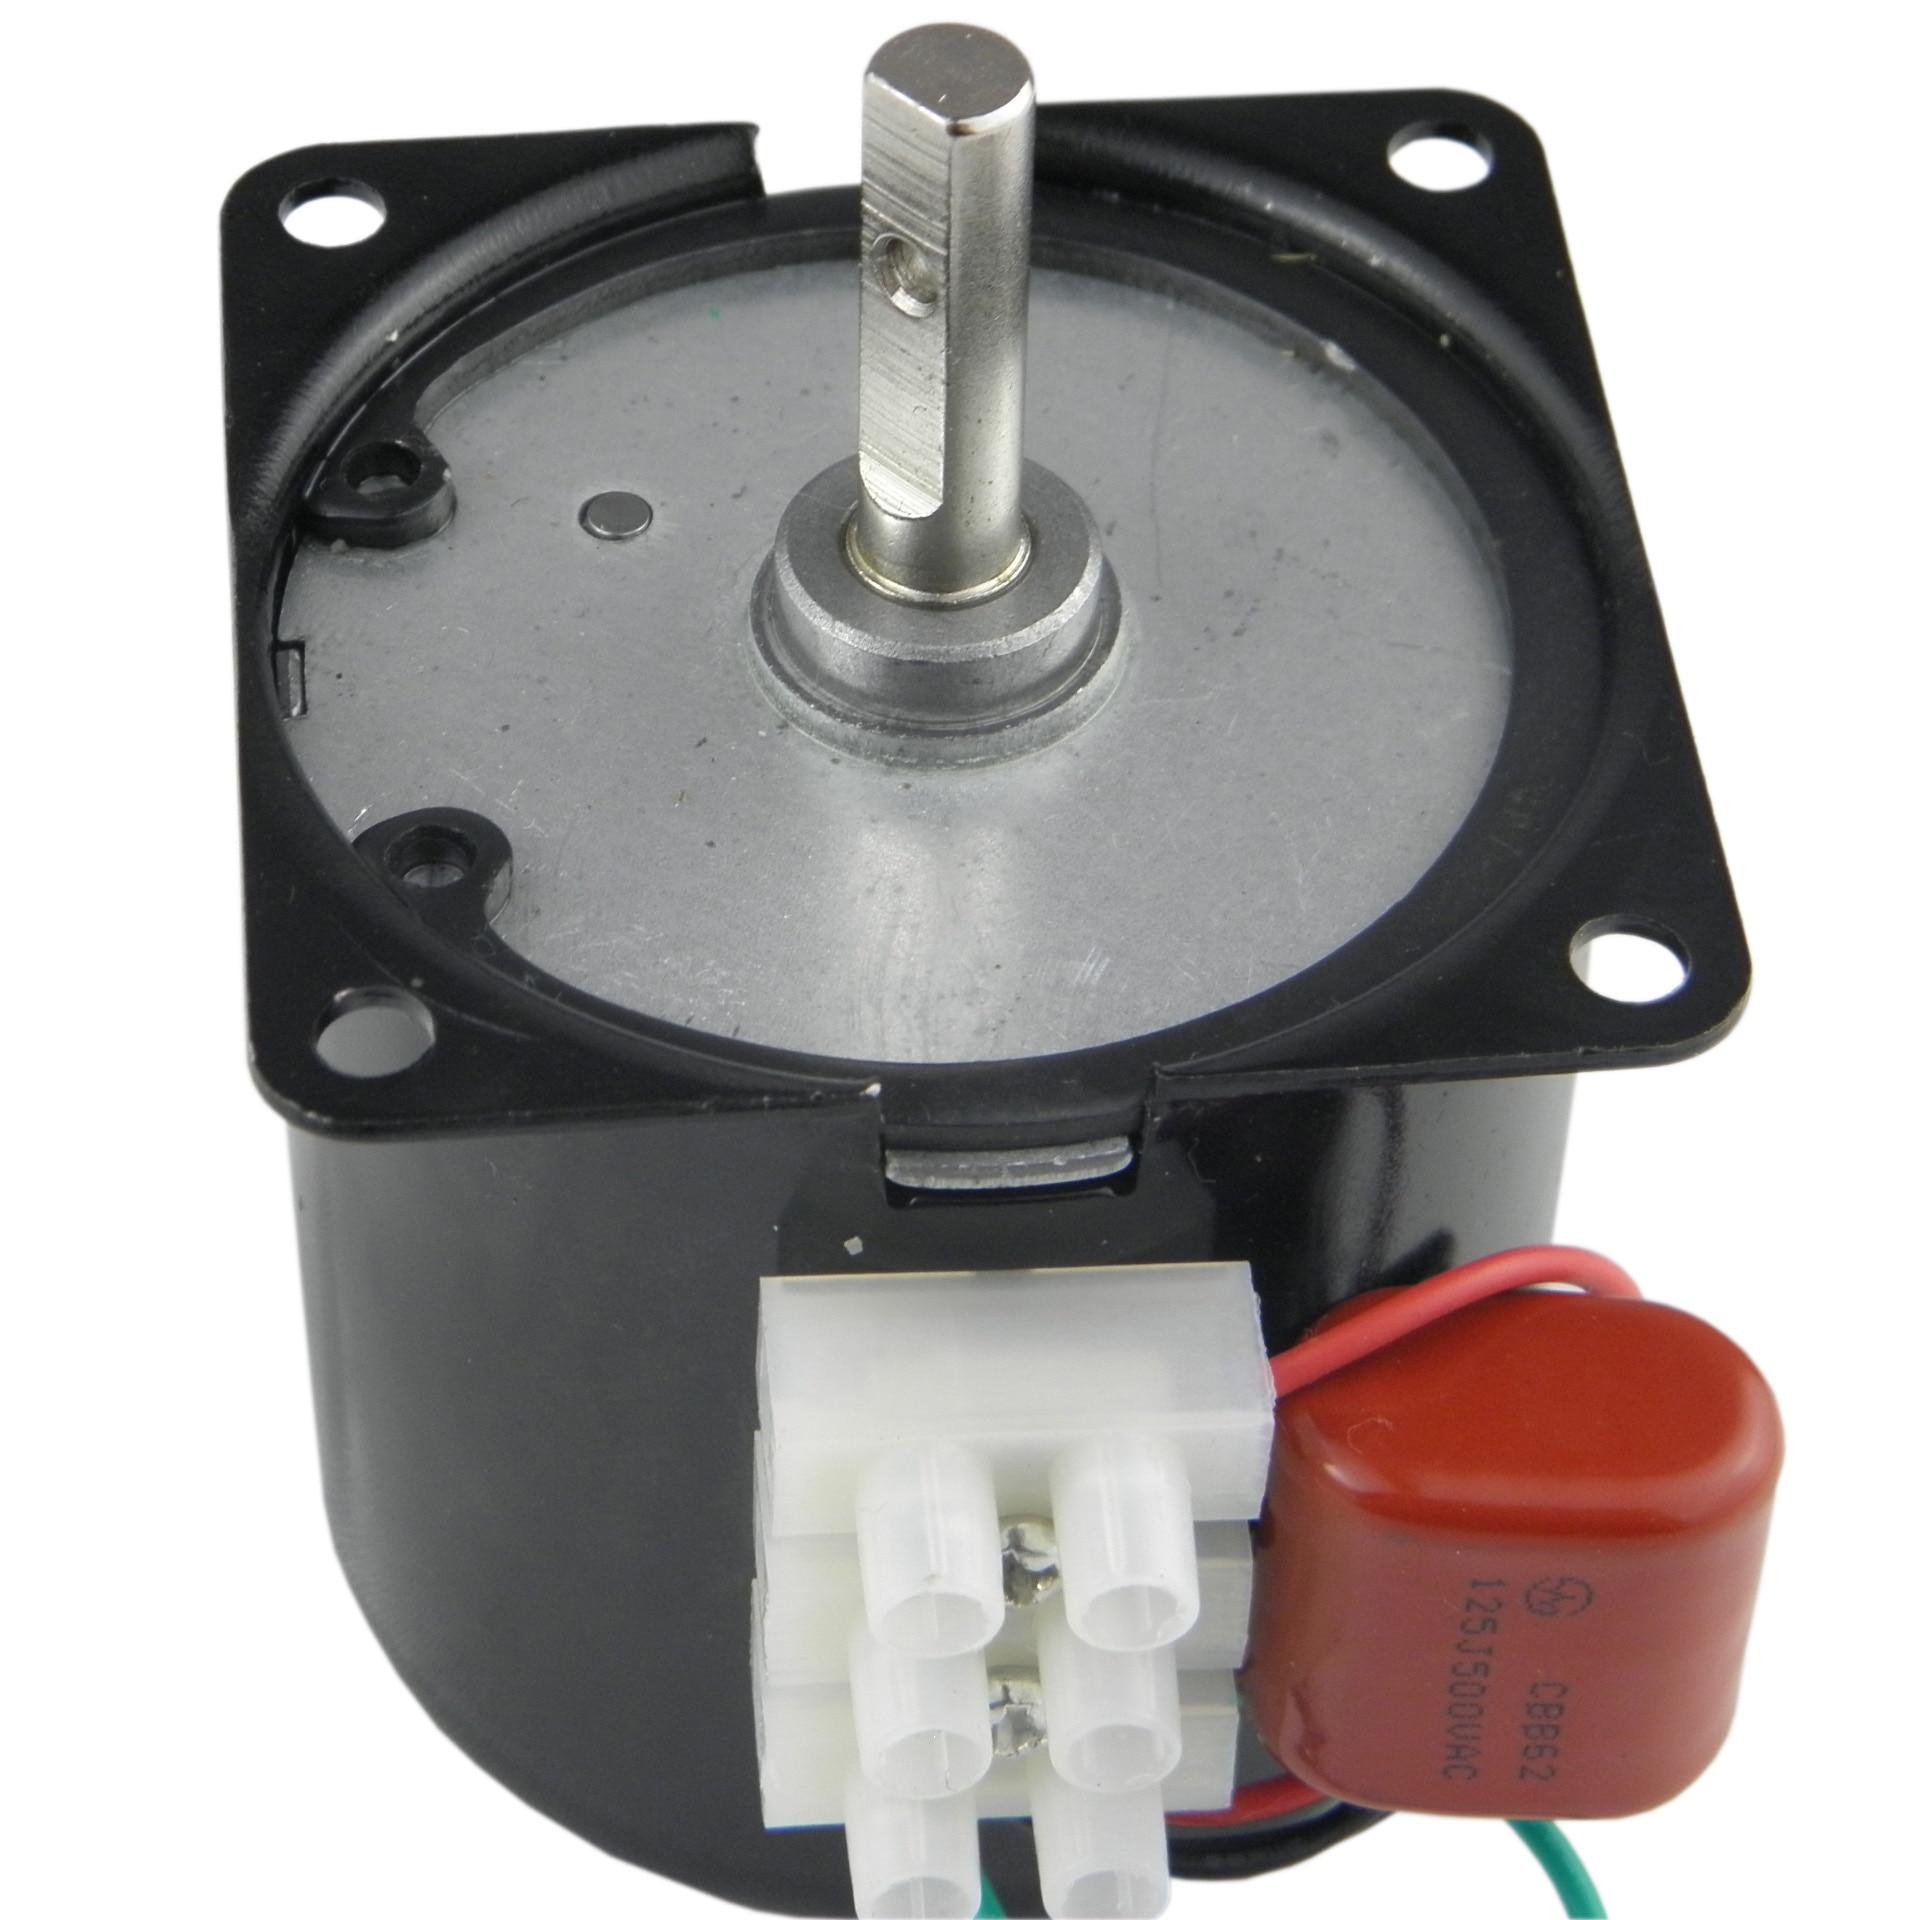 Synchronous Gear Motor,68KTYZ, 14W,1.2RPM Permanent Magnet Synchronous Motor Low Noise